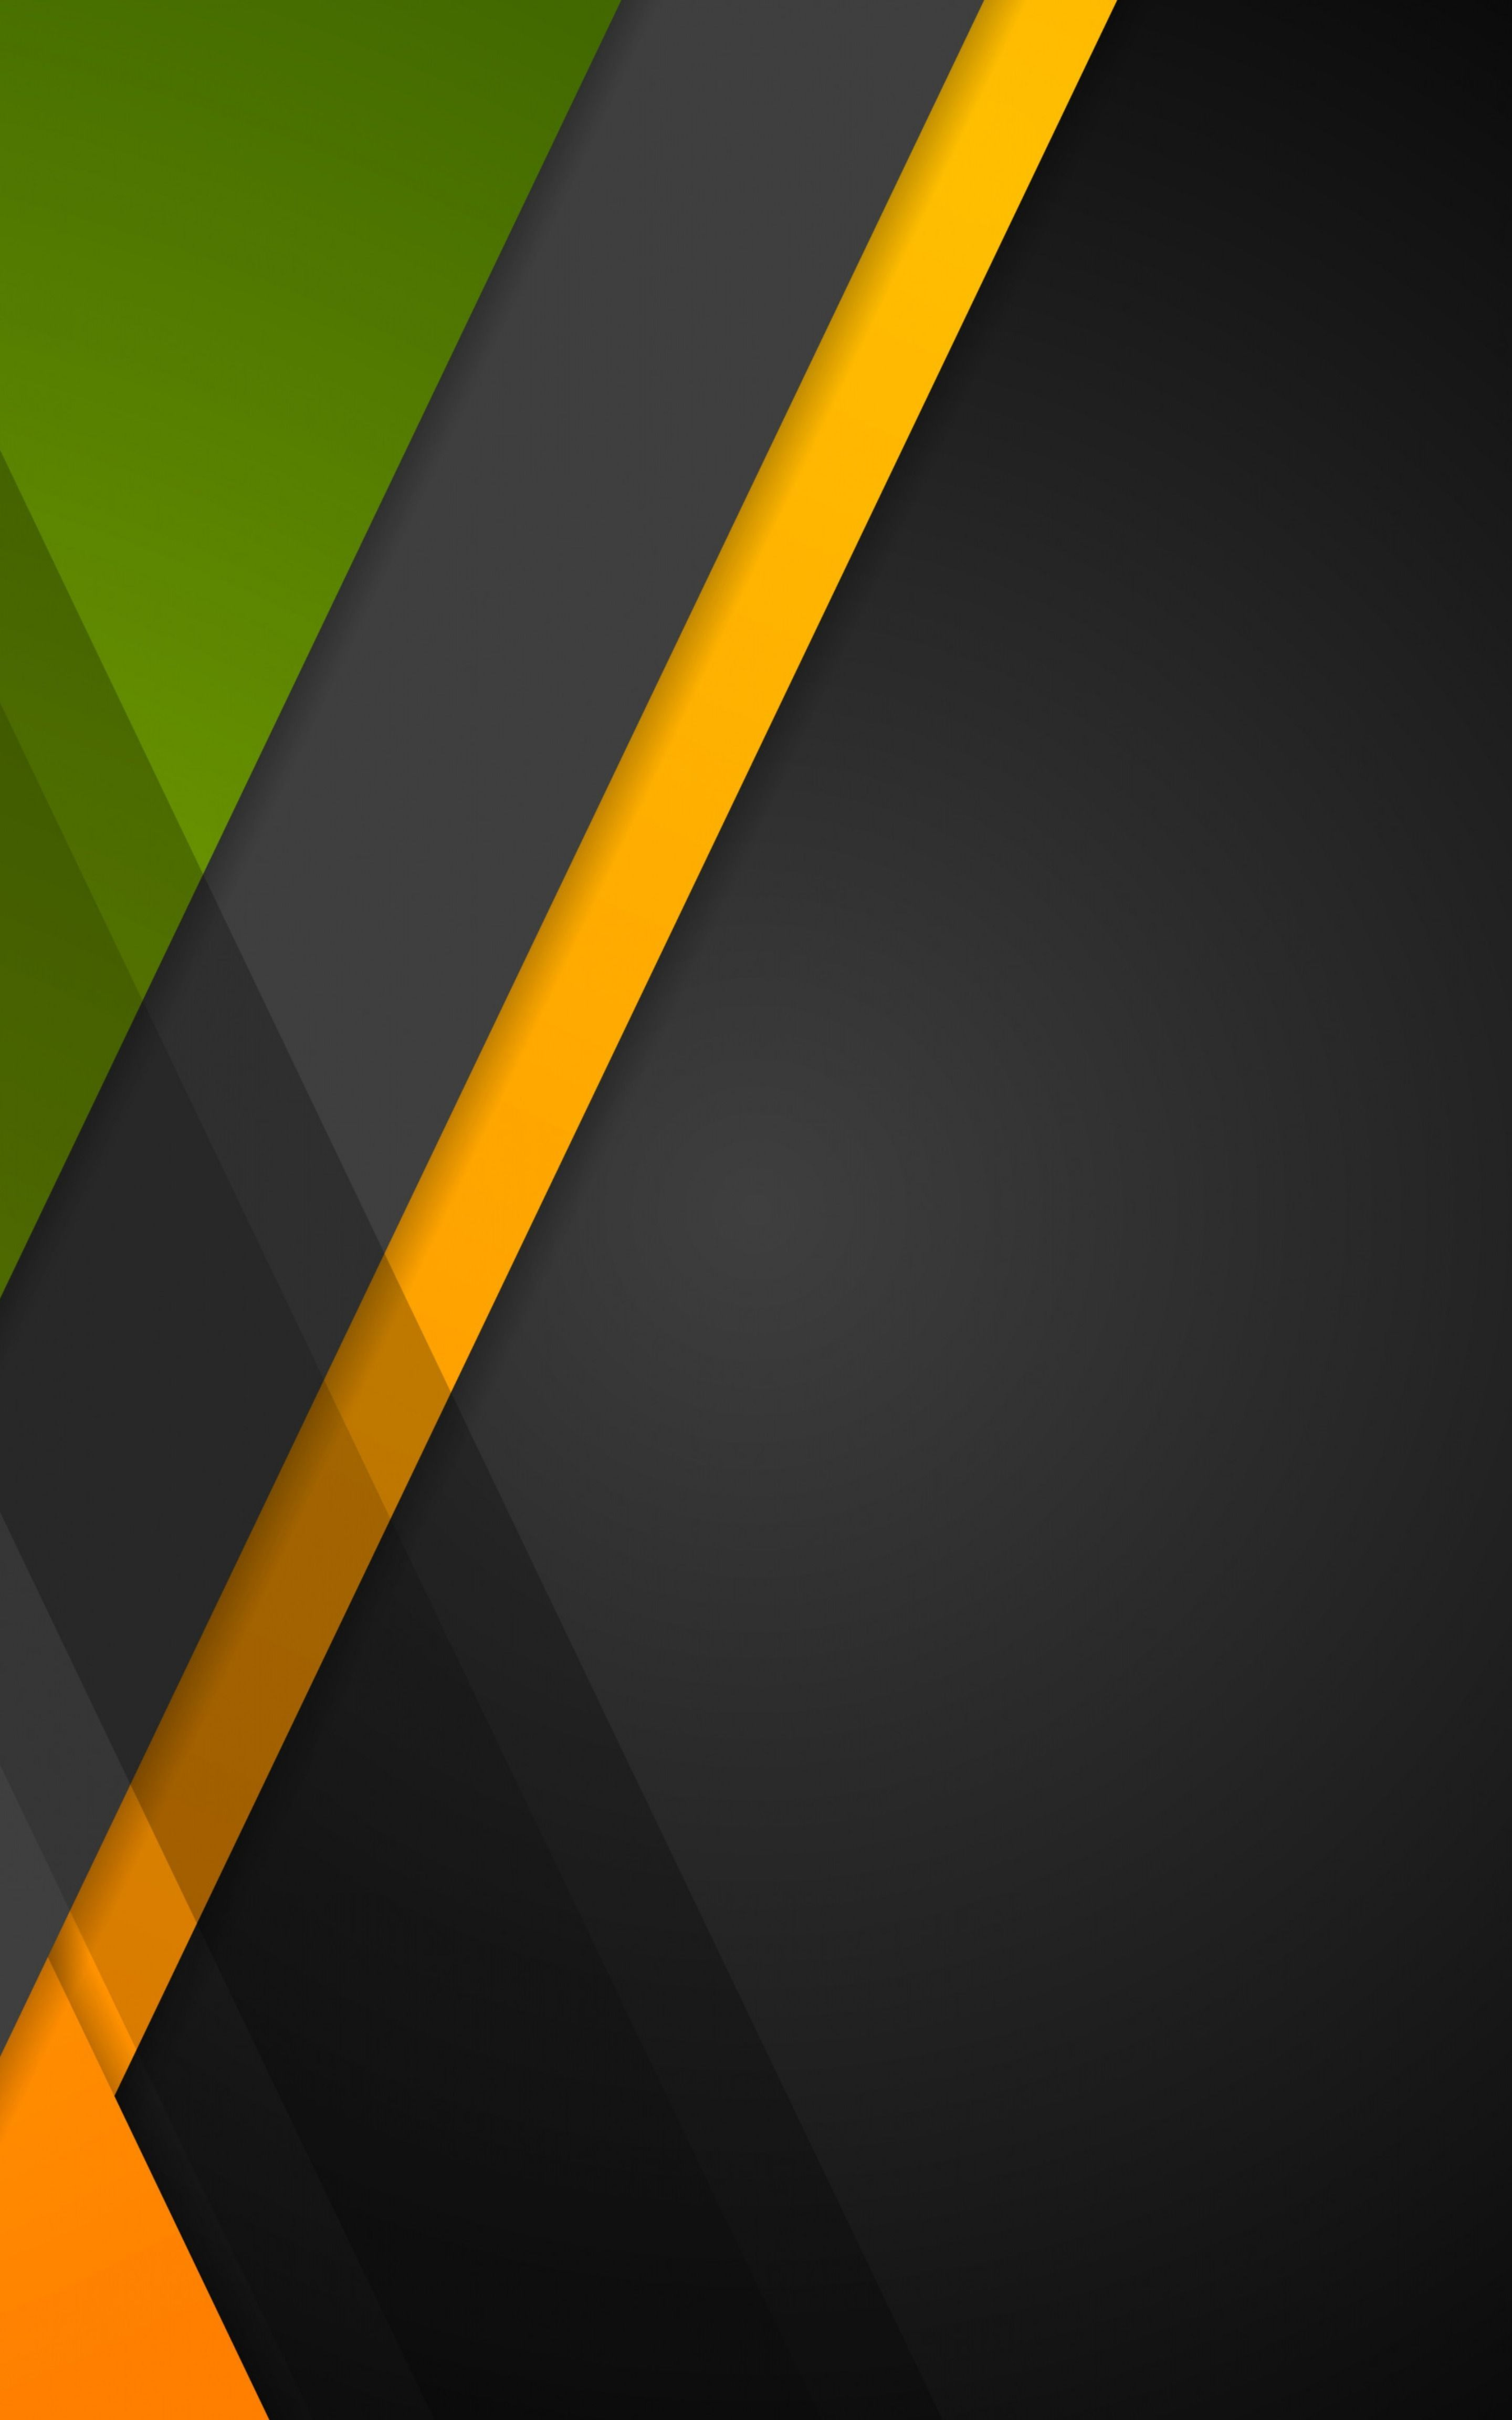 Green Black Orange Background Design Abstract Geometry Ultrahd 4k Hd Phone Wallpaper Geometric Ab In 2020 With Images Hd Phone Wallpapers Orange Background Background Design